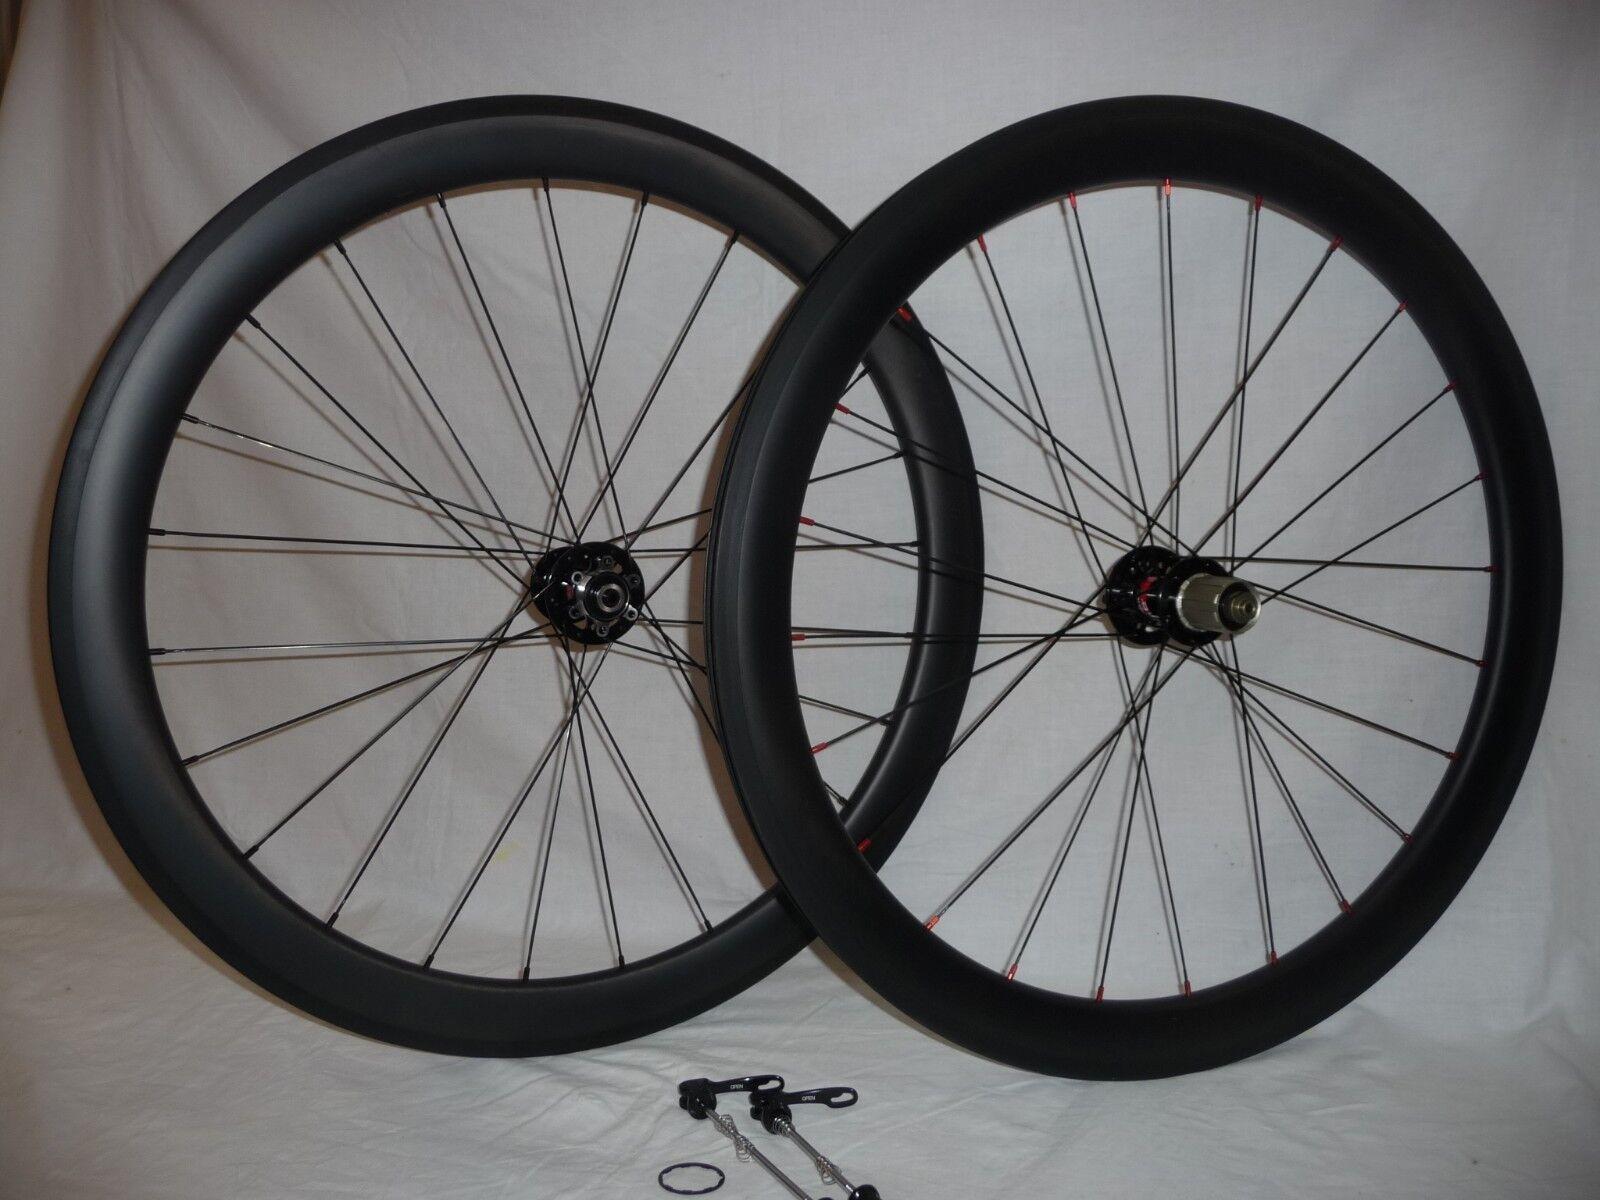 EXTRA Wide 50mm Deep Carbon Freno A Disco StradaGhiaia ruote bici